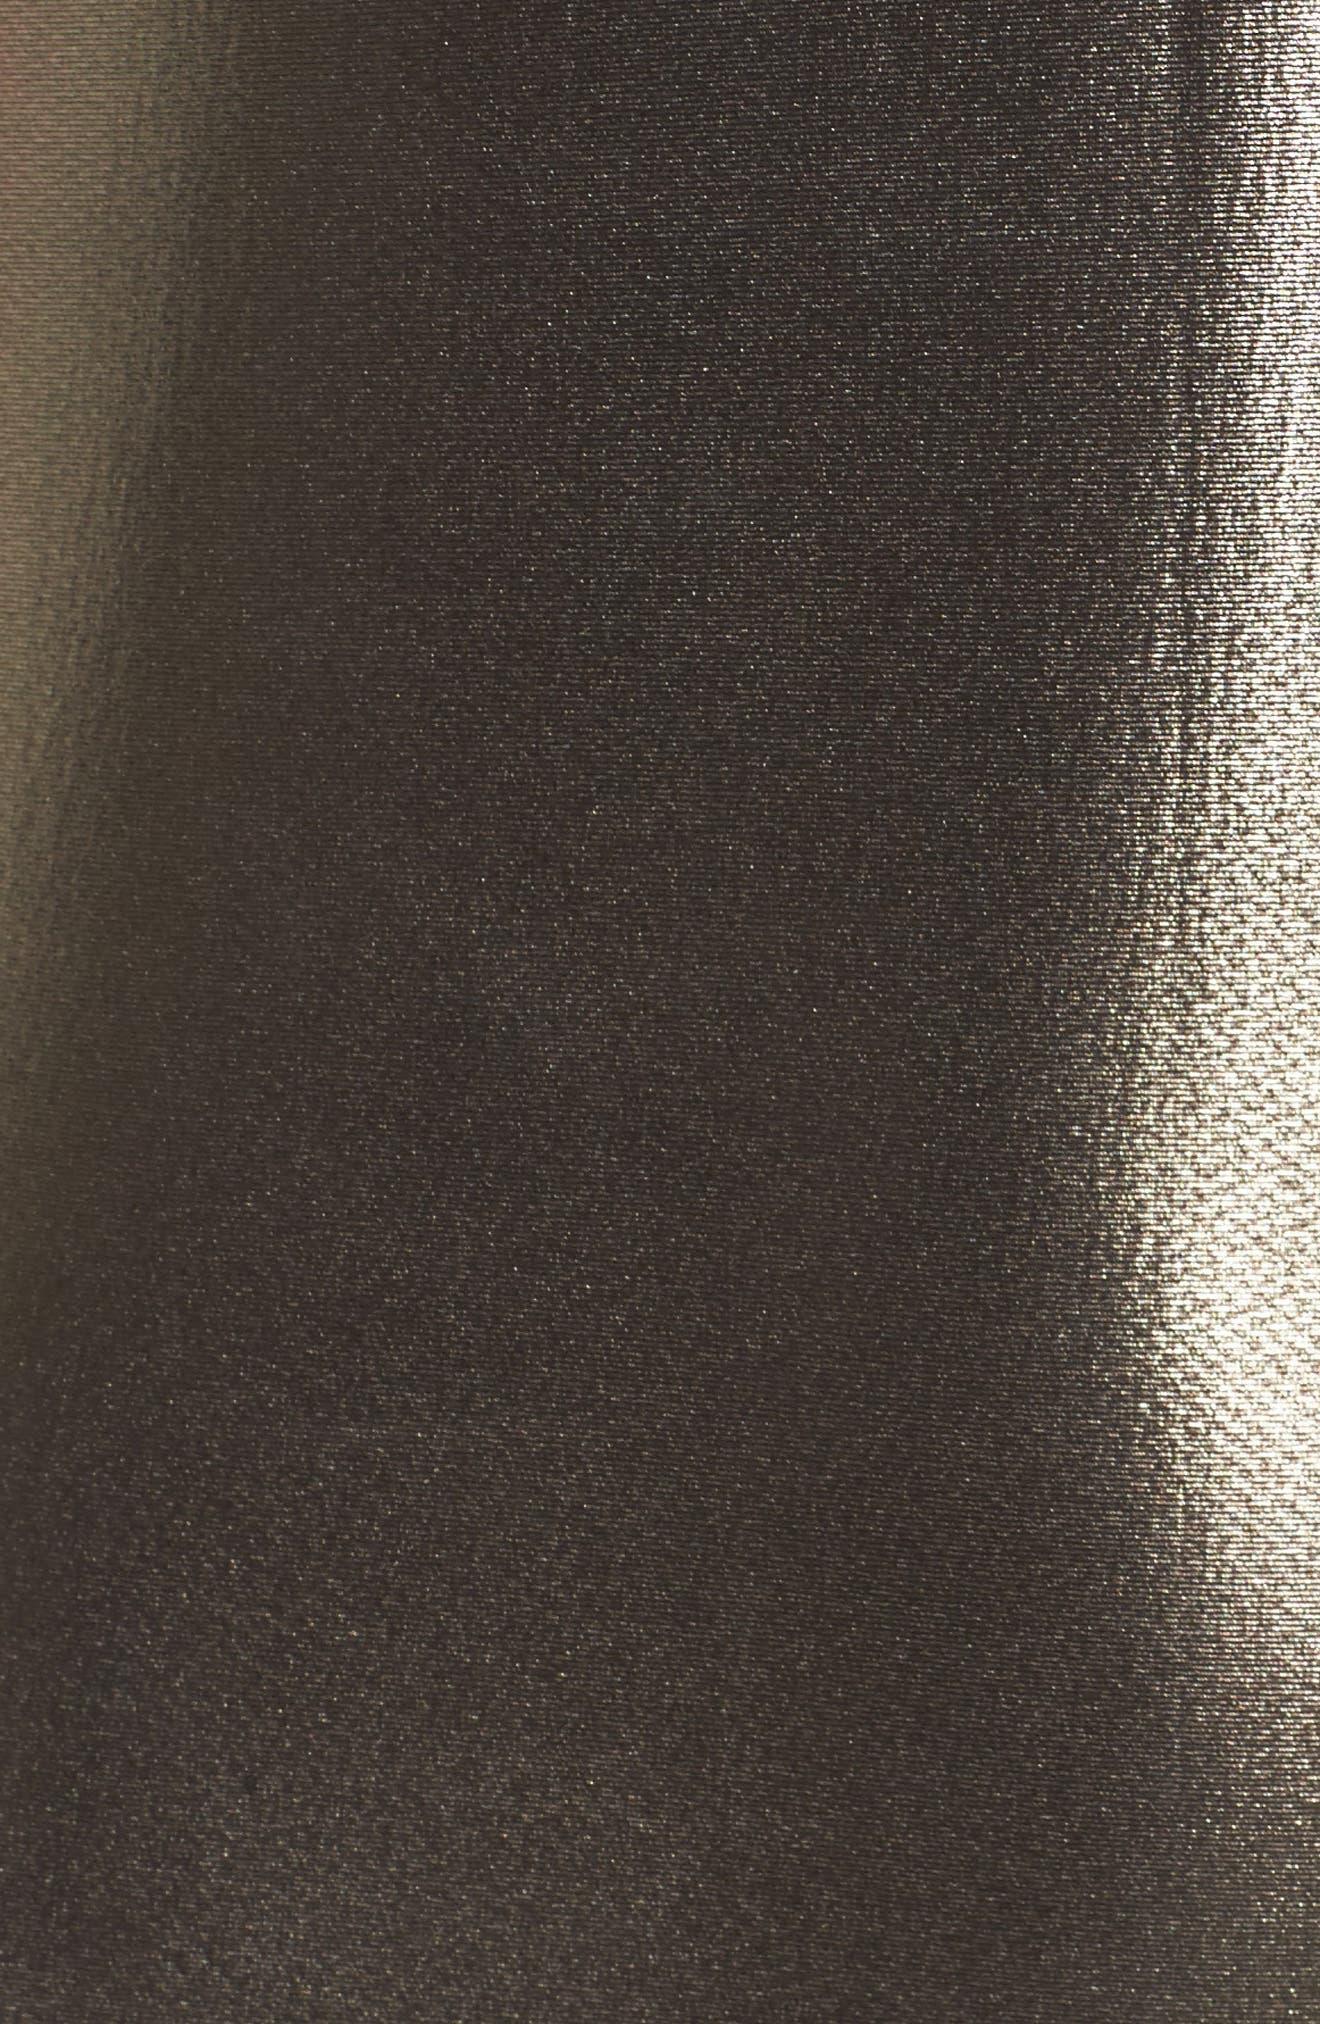 Metallic One-Piece Swimsuit,                             Alternate thumbnail 5, color,                             030